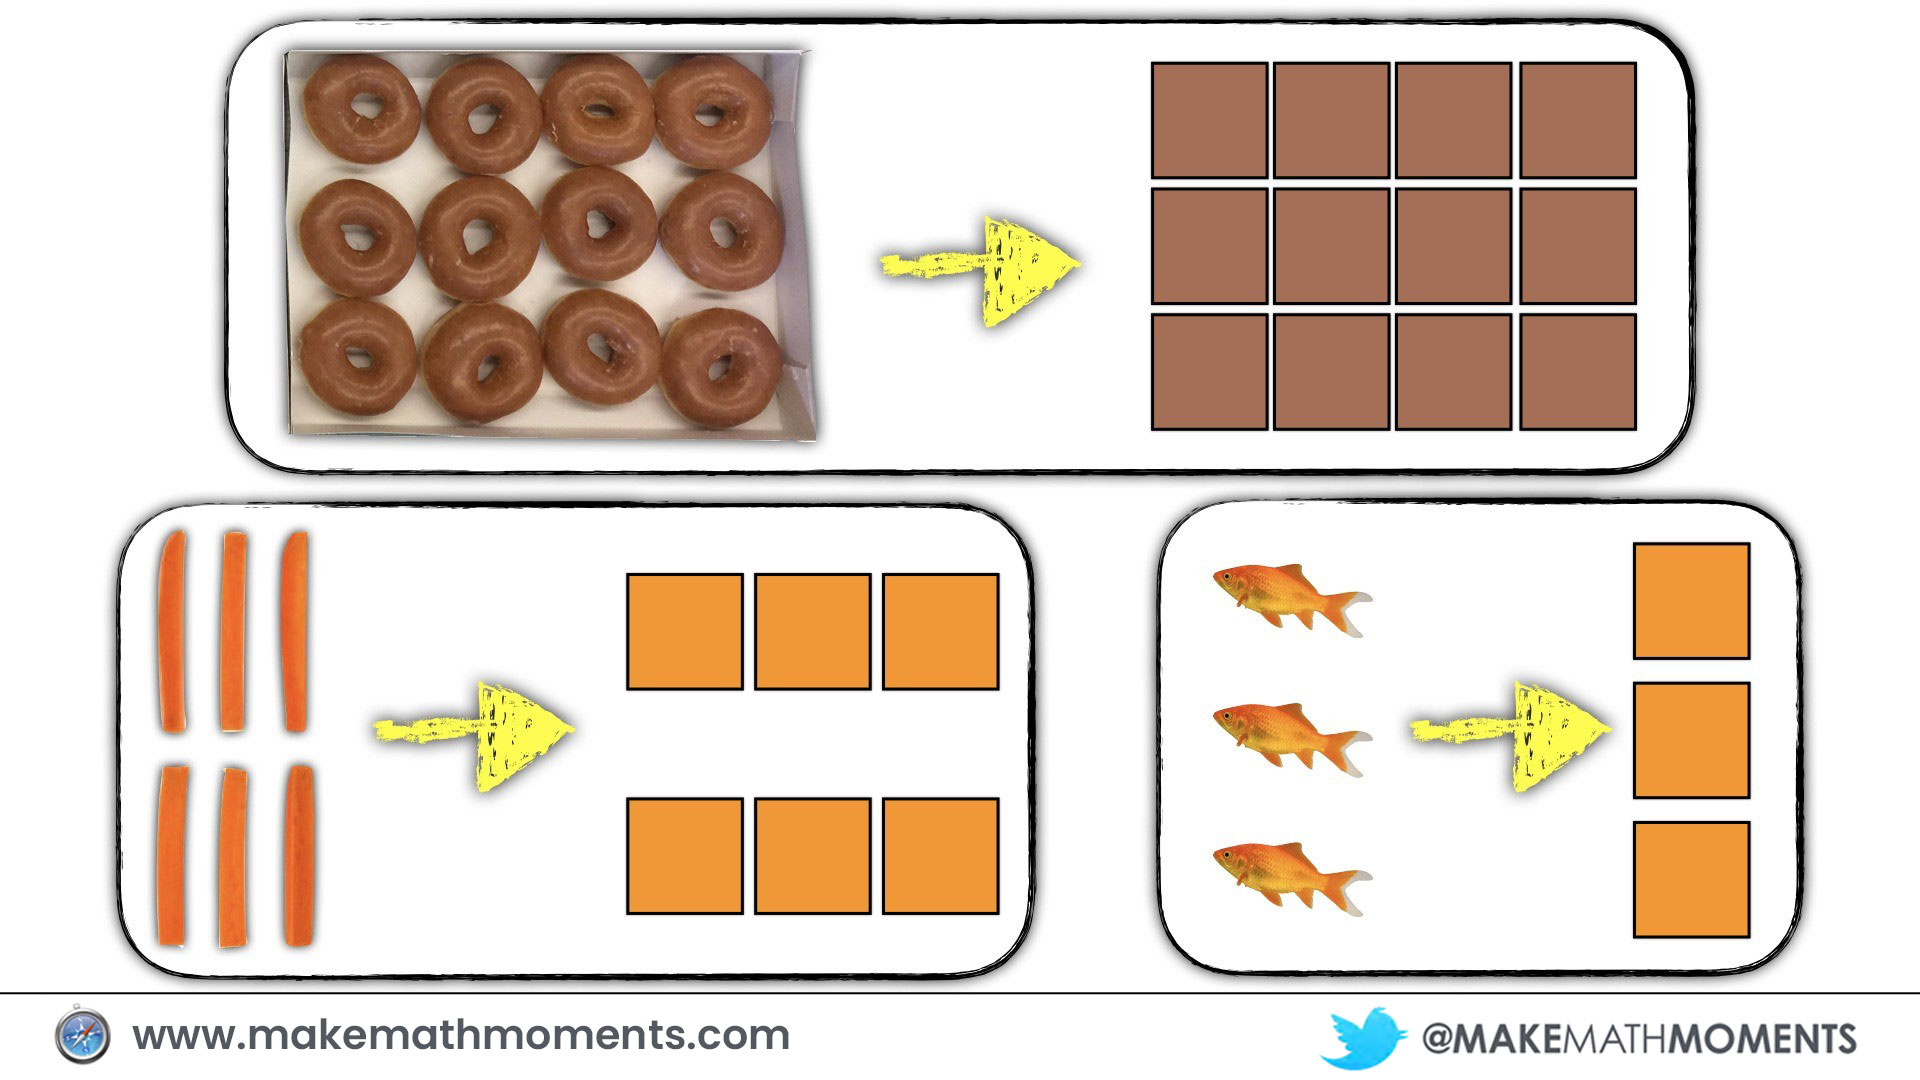 Using Manipulatives - Square Tiles